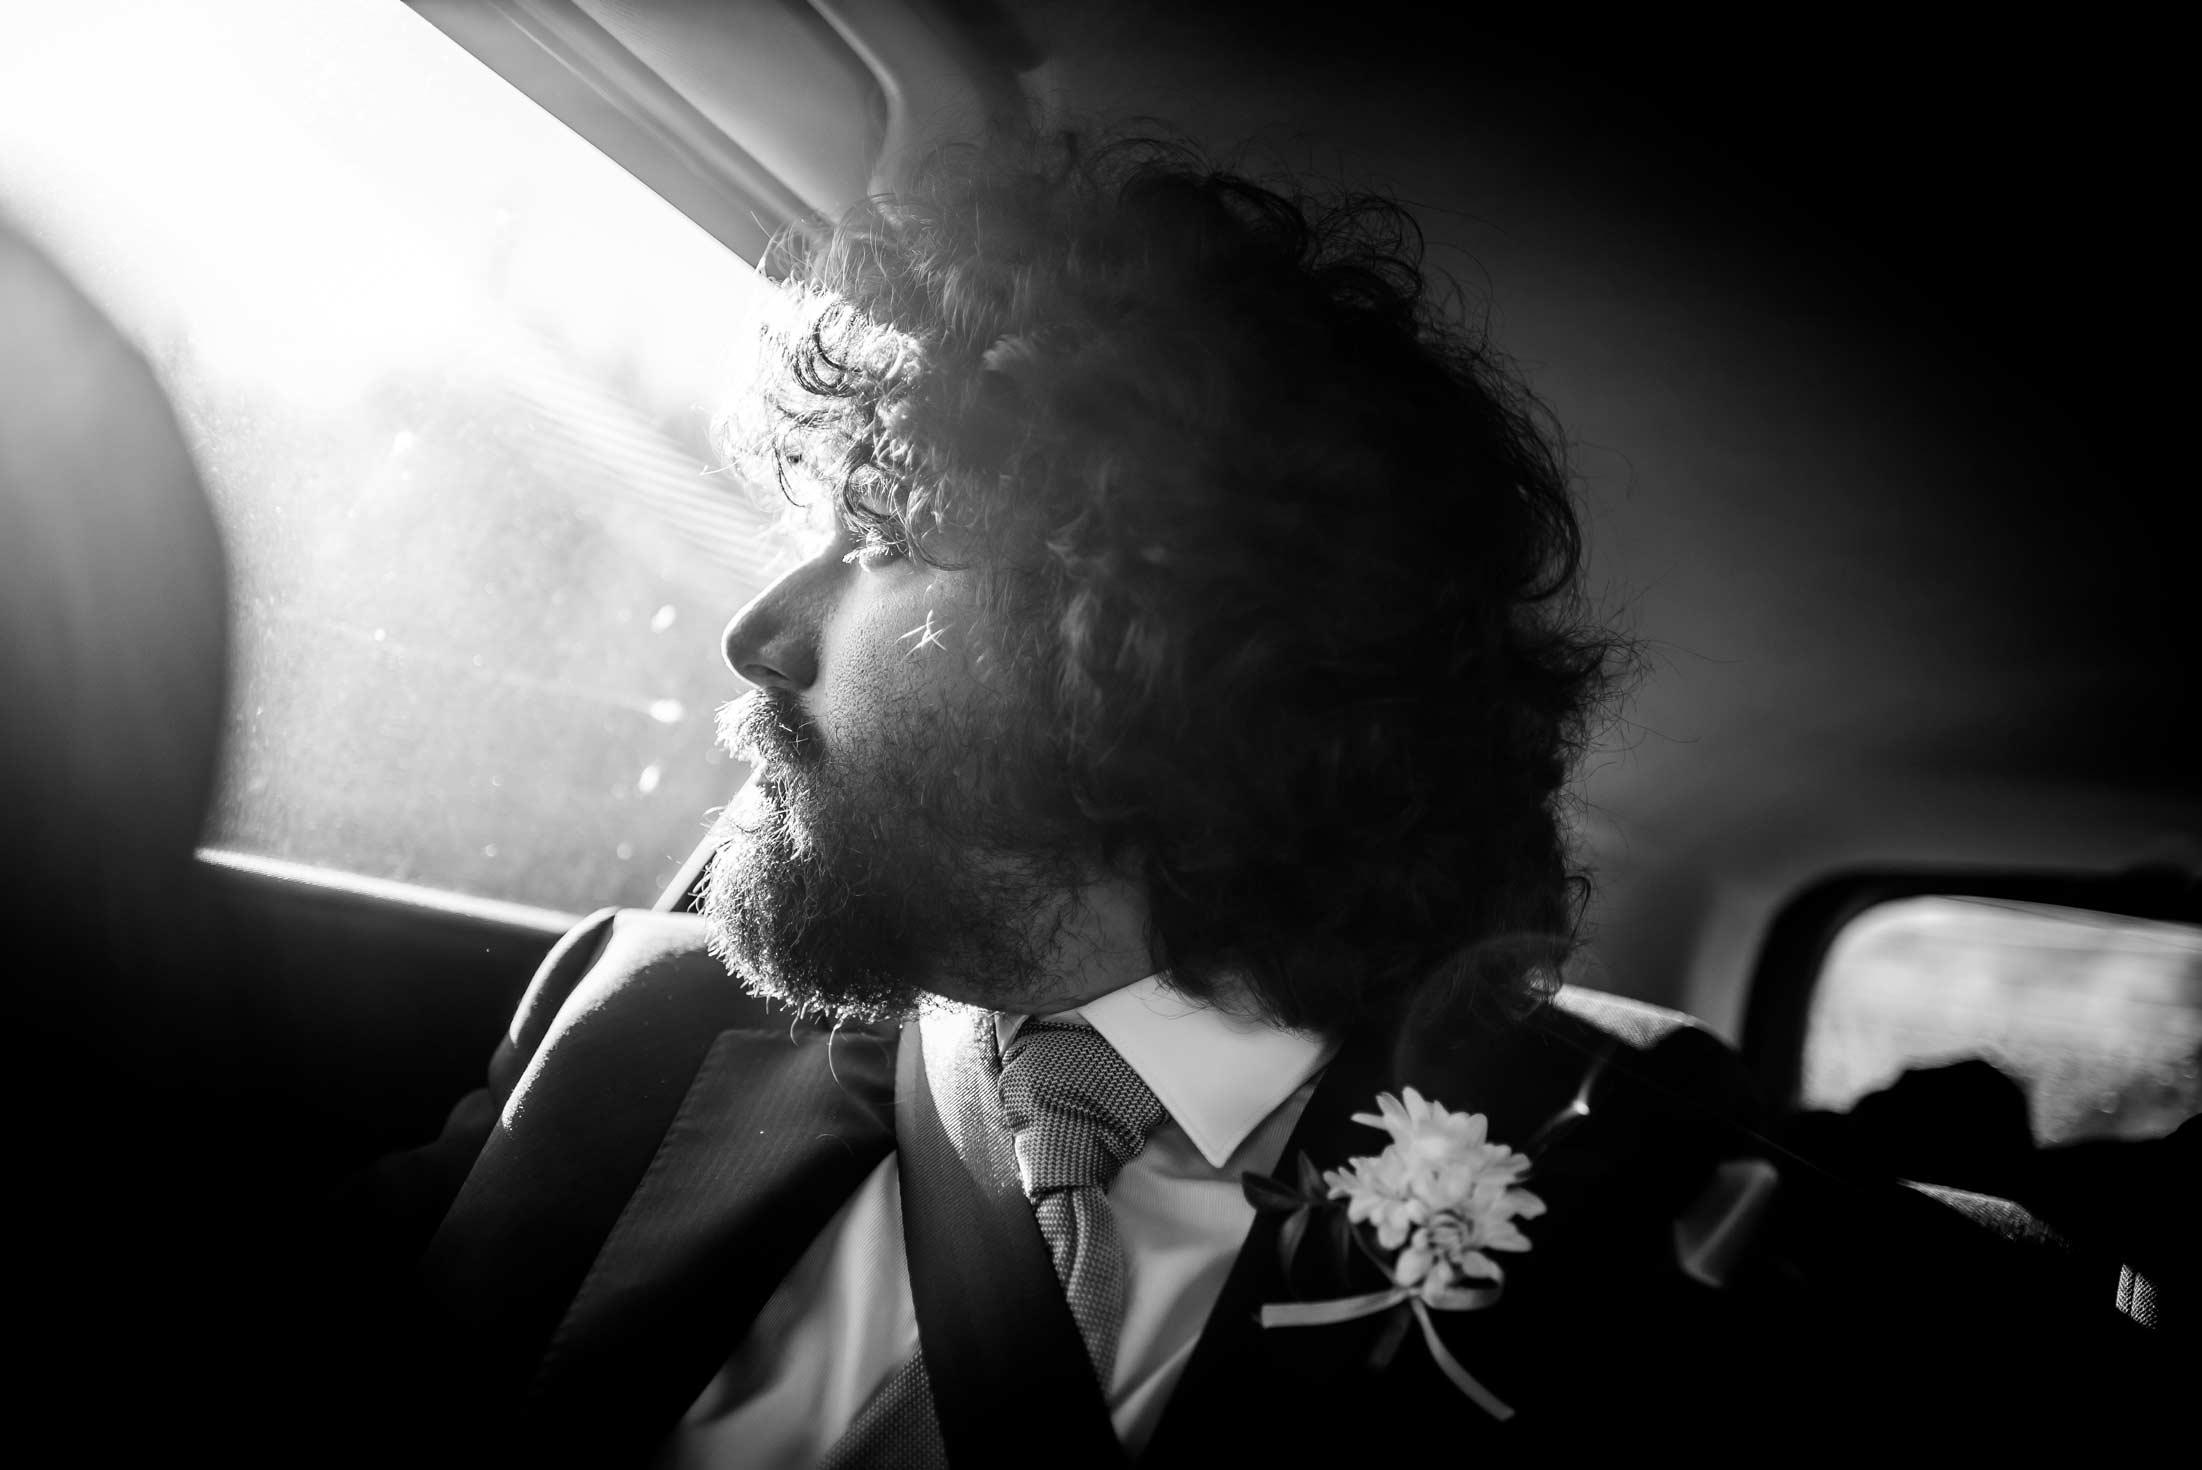 Fotoreportage-Matrimonio-Preparativi-Sposo